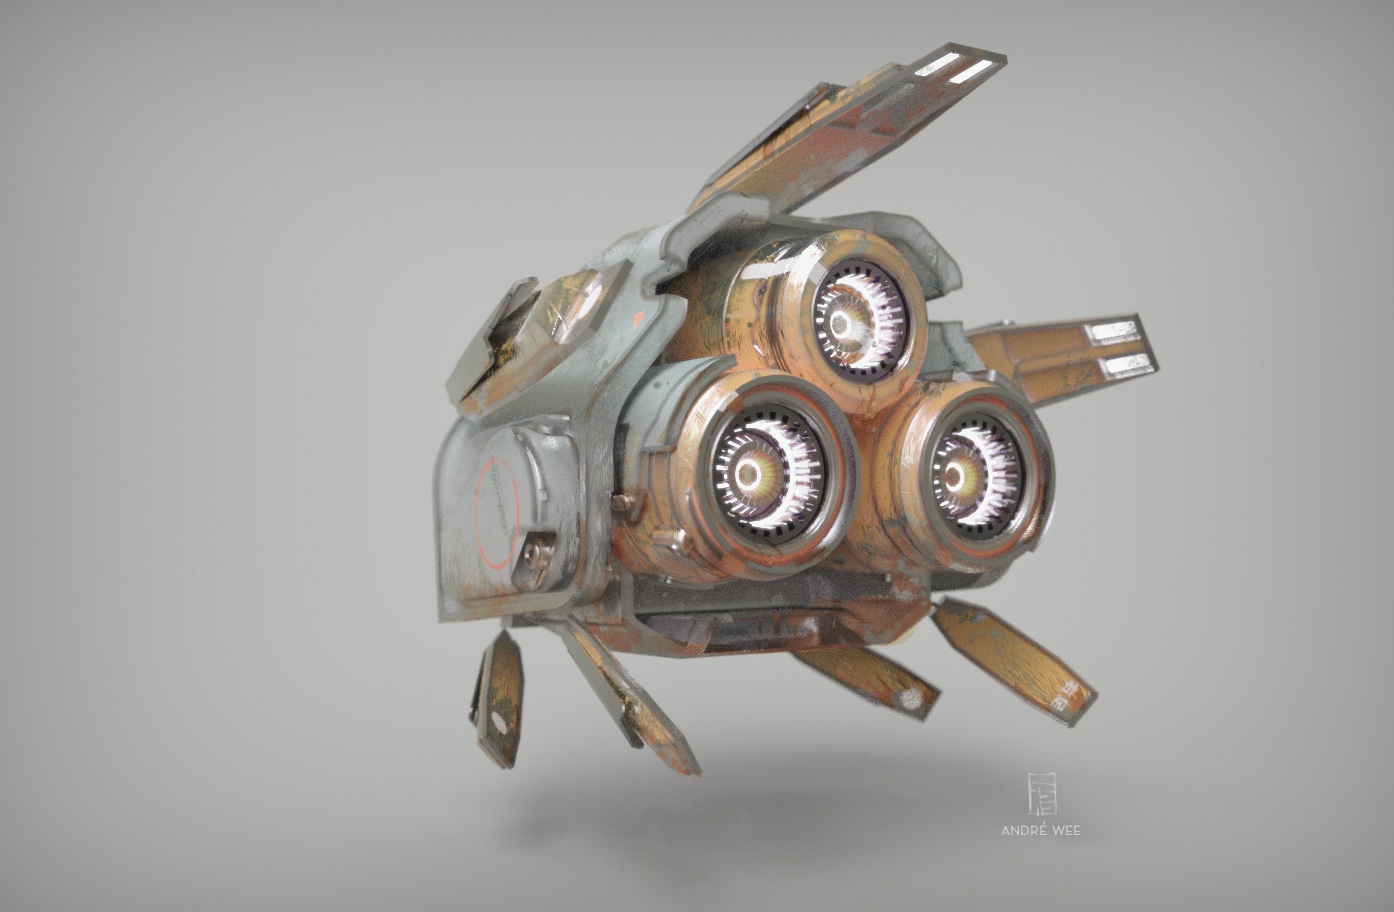 Scifi_vehicle2.214.jpg